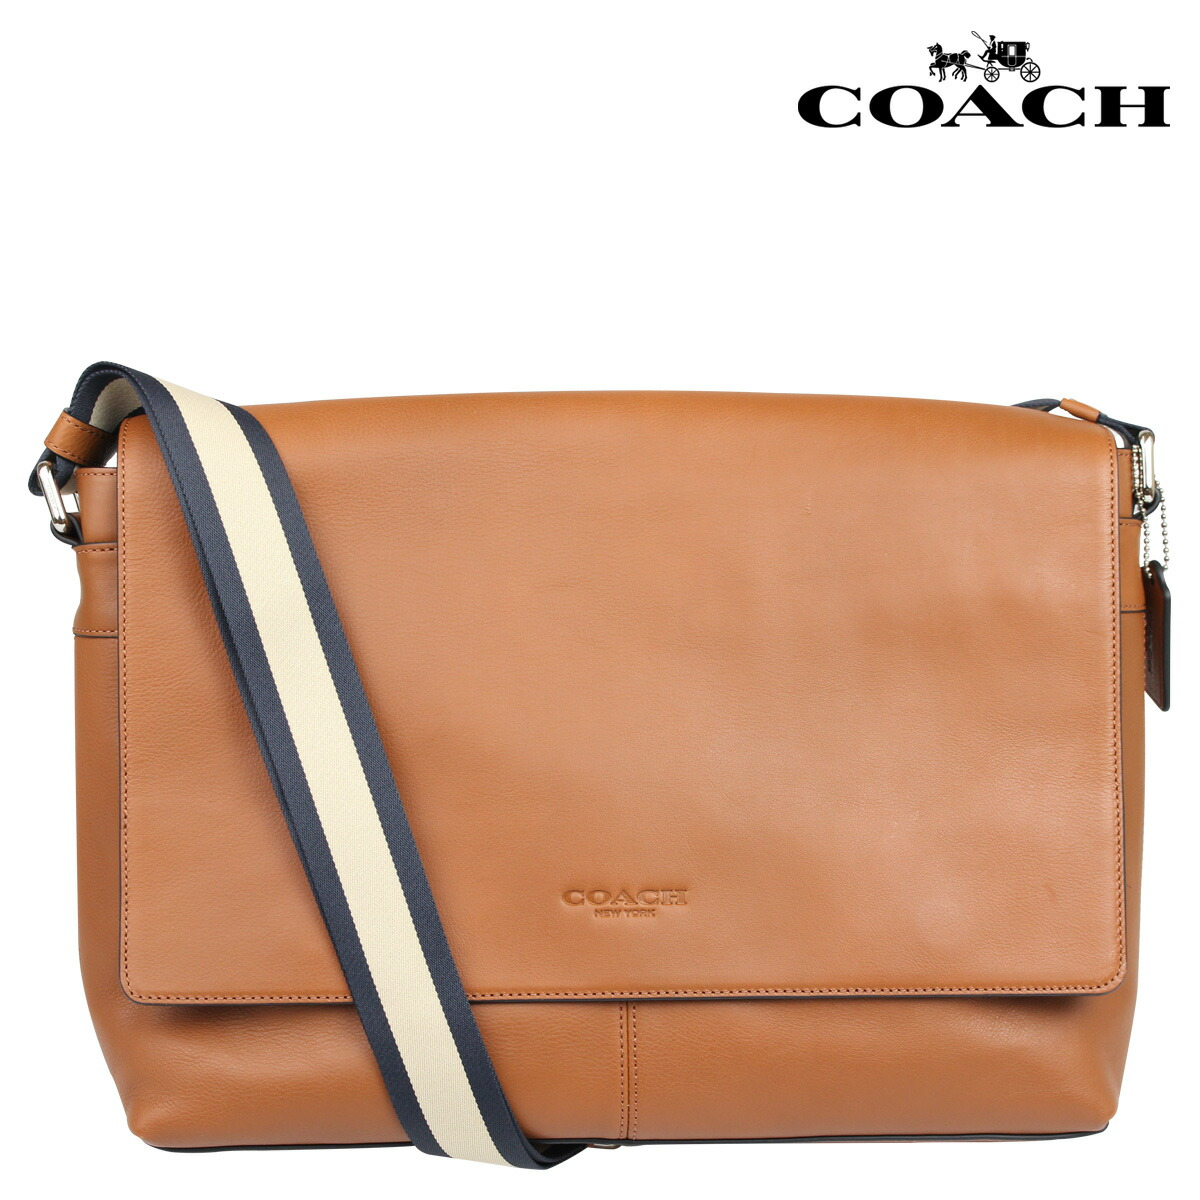 coach men outlet online 0eqa  coach mens messenger bag outlet